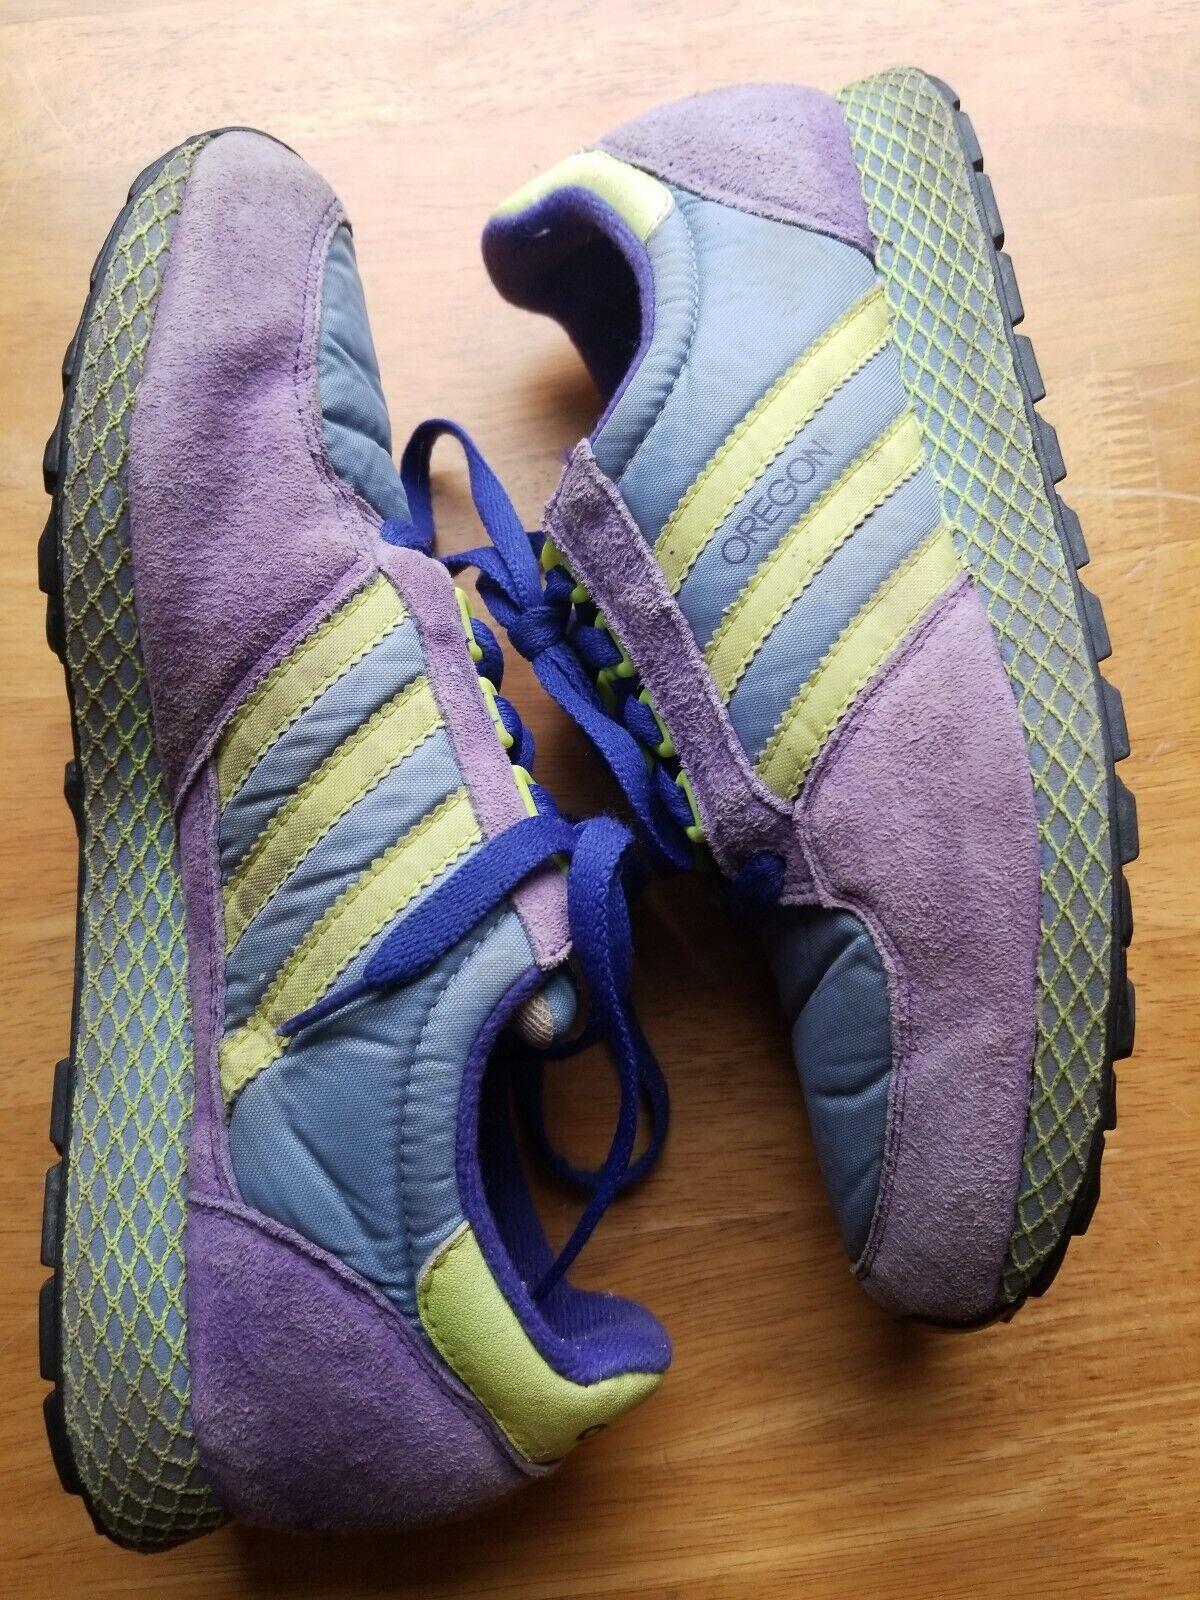 Adidas Vintage Running Running Running Walking shoes Oregon Purple Yellow bluee Womens 6.5 ab9559